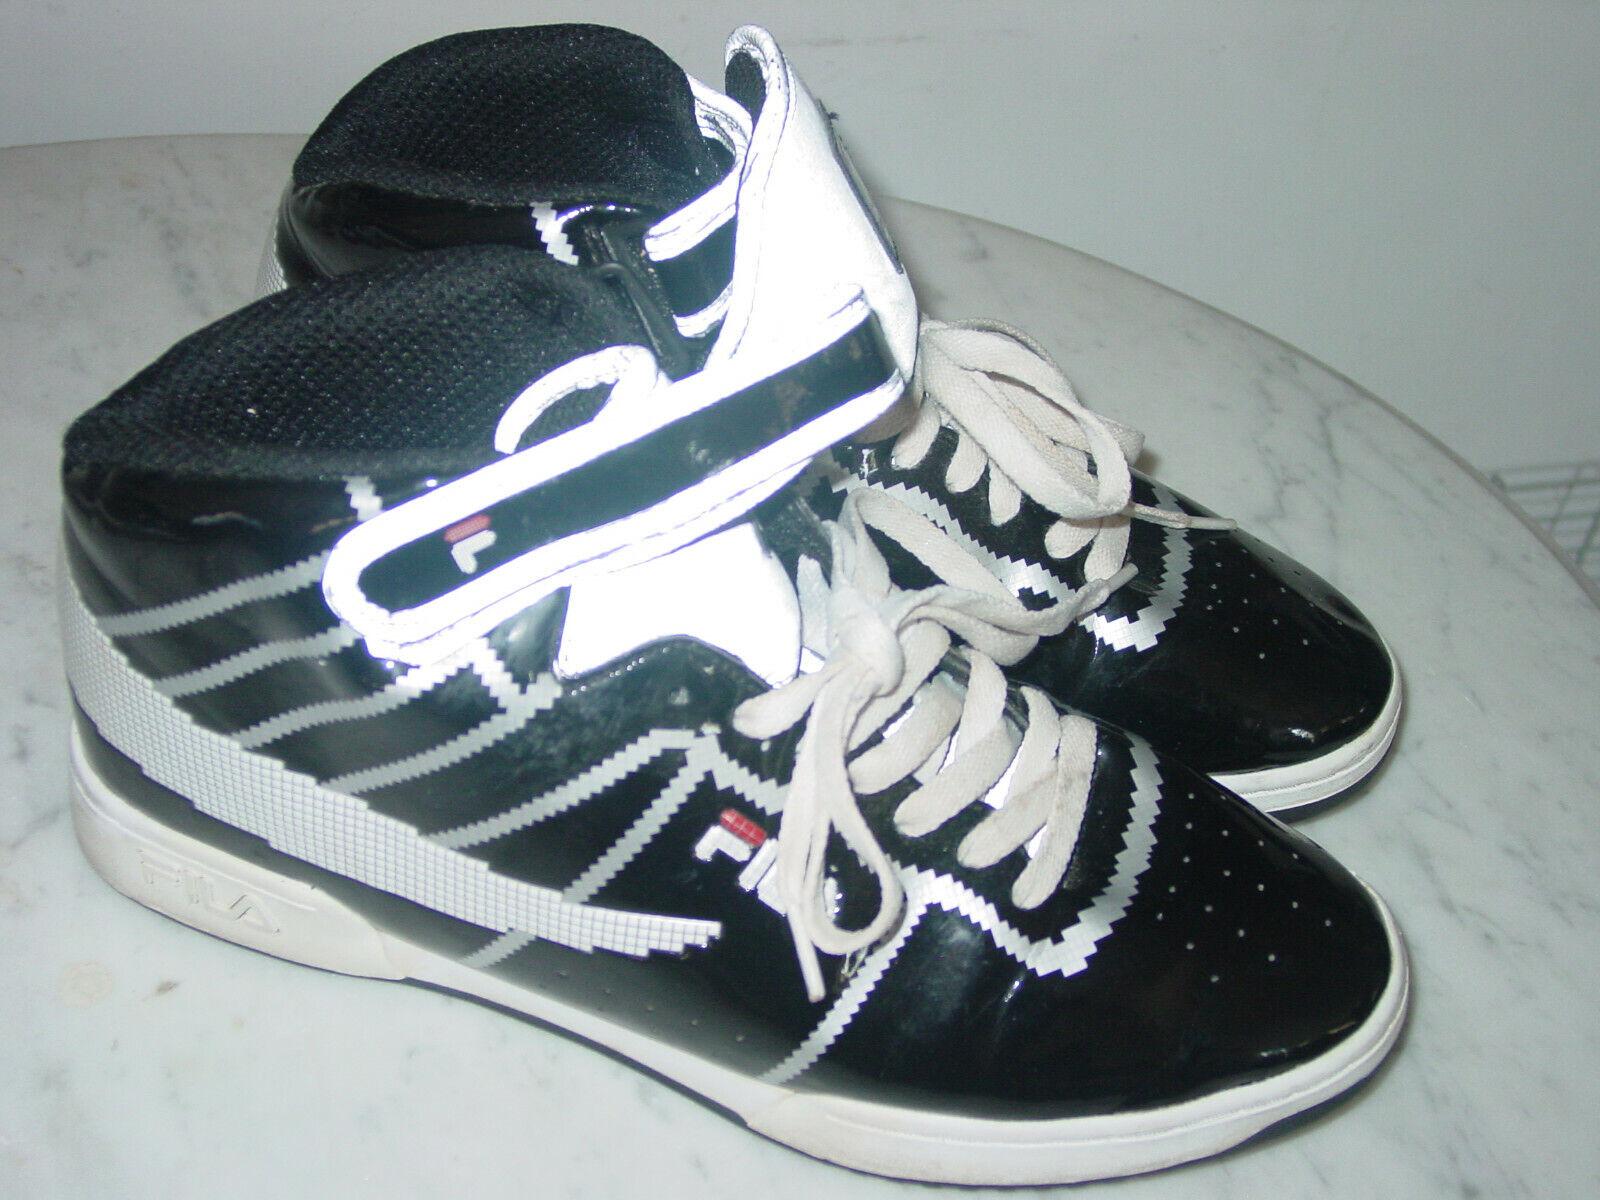 Para Hombre FILA  Digital F-13  1VF082XX-013 Negro blancoo Rojo Mid Top Zapatos